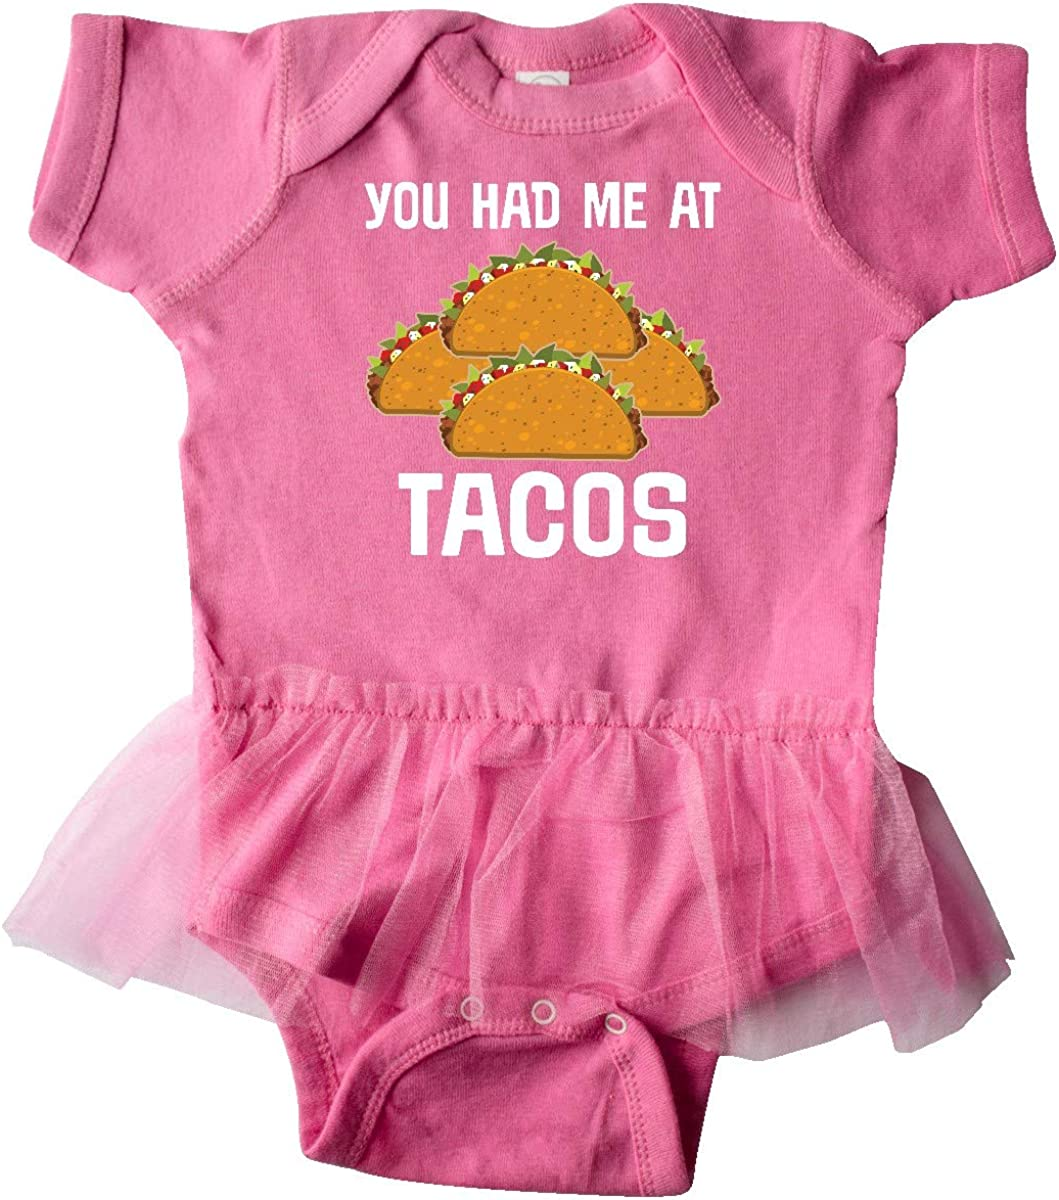 inktastic You Had Me at Tacos Infant Tutu Bodysuit